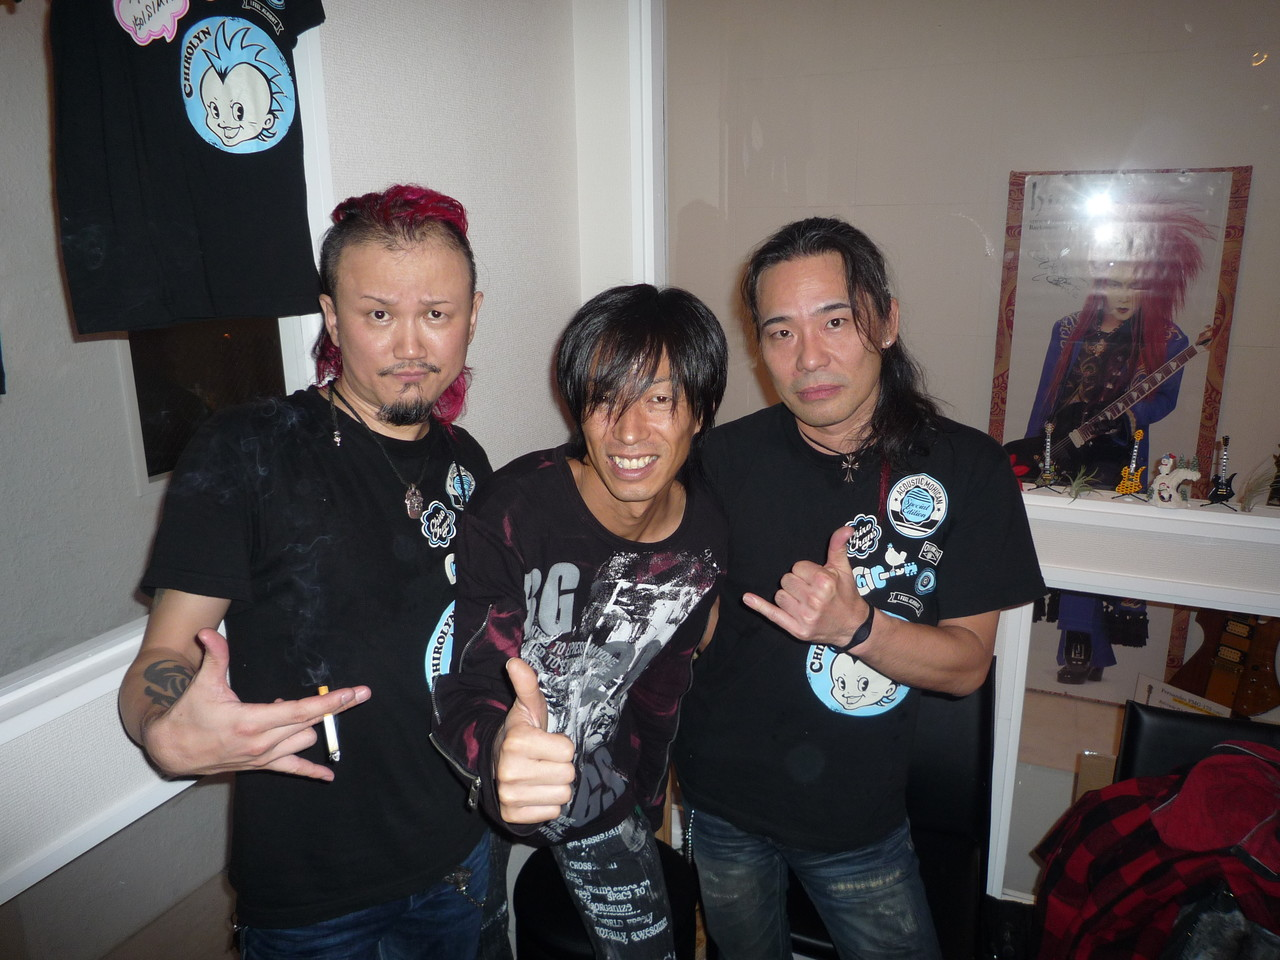 ChiroLynさんとRyojiさんと念願の3ショット!